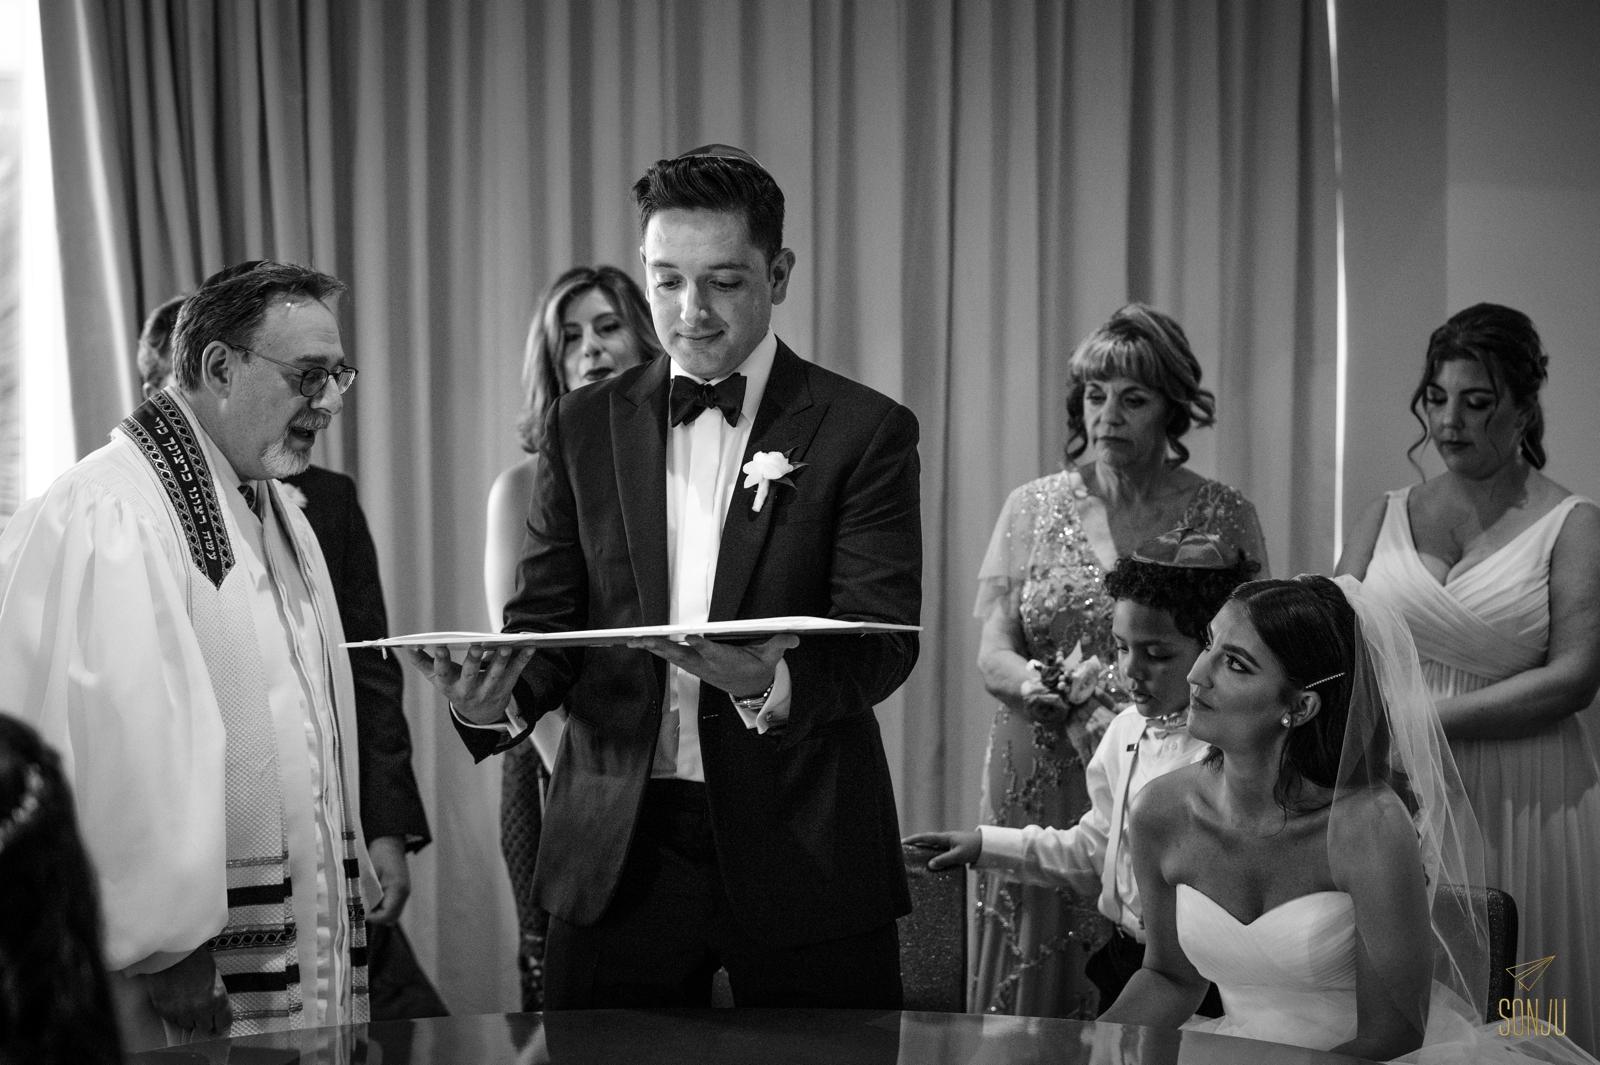 W-Fort-Lauderdale-Wedding-Photographer-South-Florida-Weddings-Michelle-Eric-Sonju00018.jpg